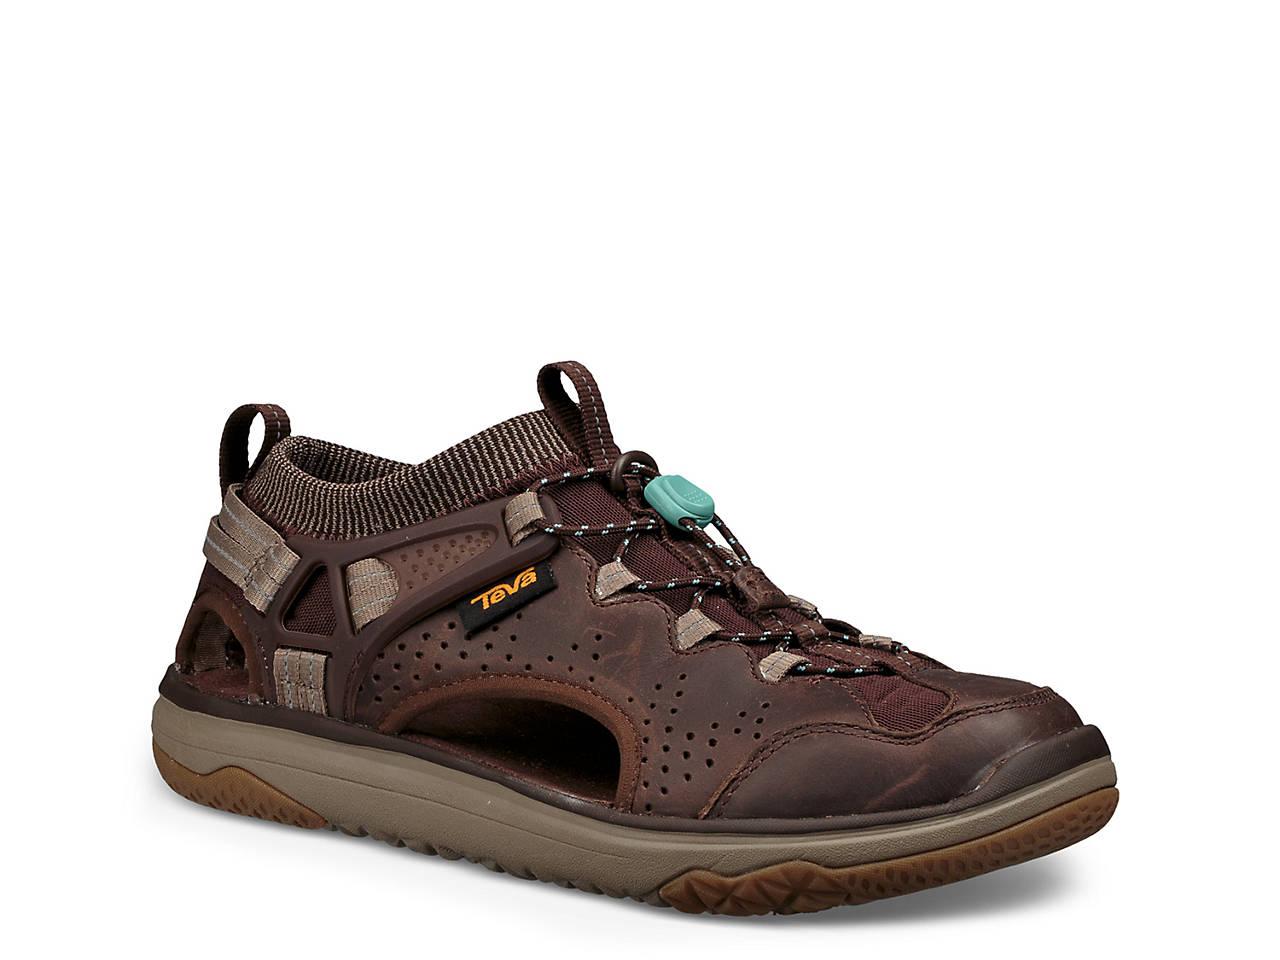 317c44f0053f Teva Terra Float Travel Lace Sport Flat Women s Shoes